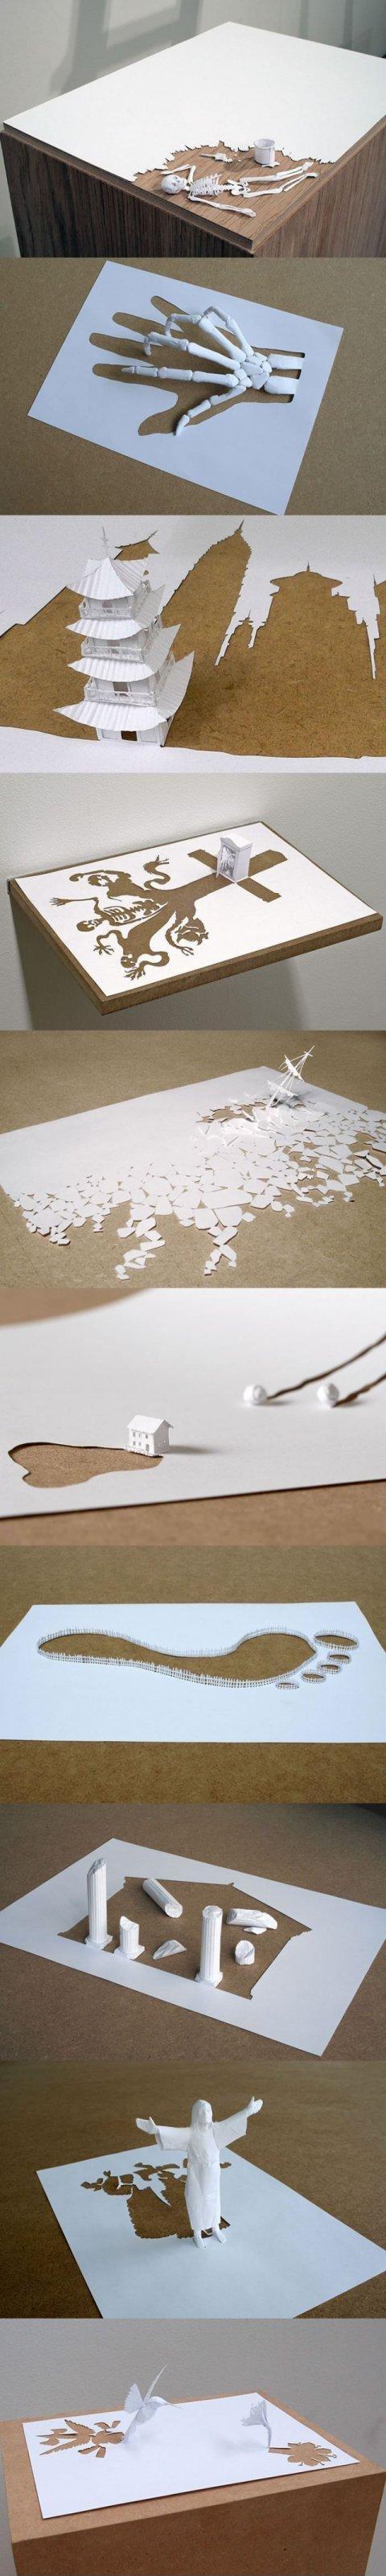 amazing paper art. credits to Peter Callesen.. WTF?! Tobi isnt Obito you retard paper Art amazing